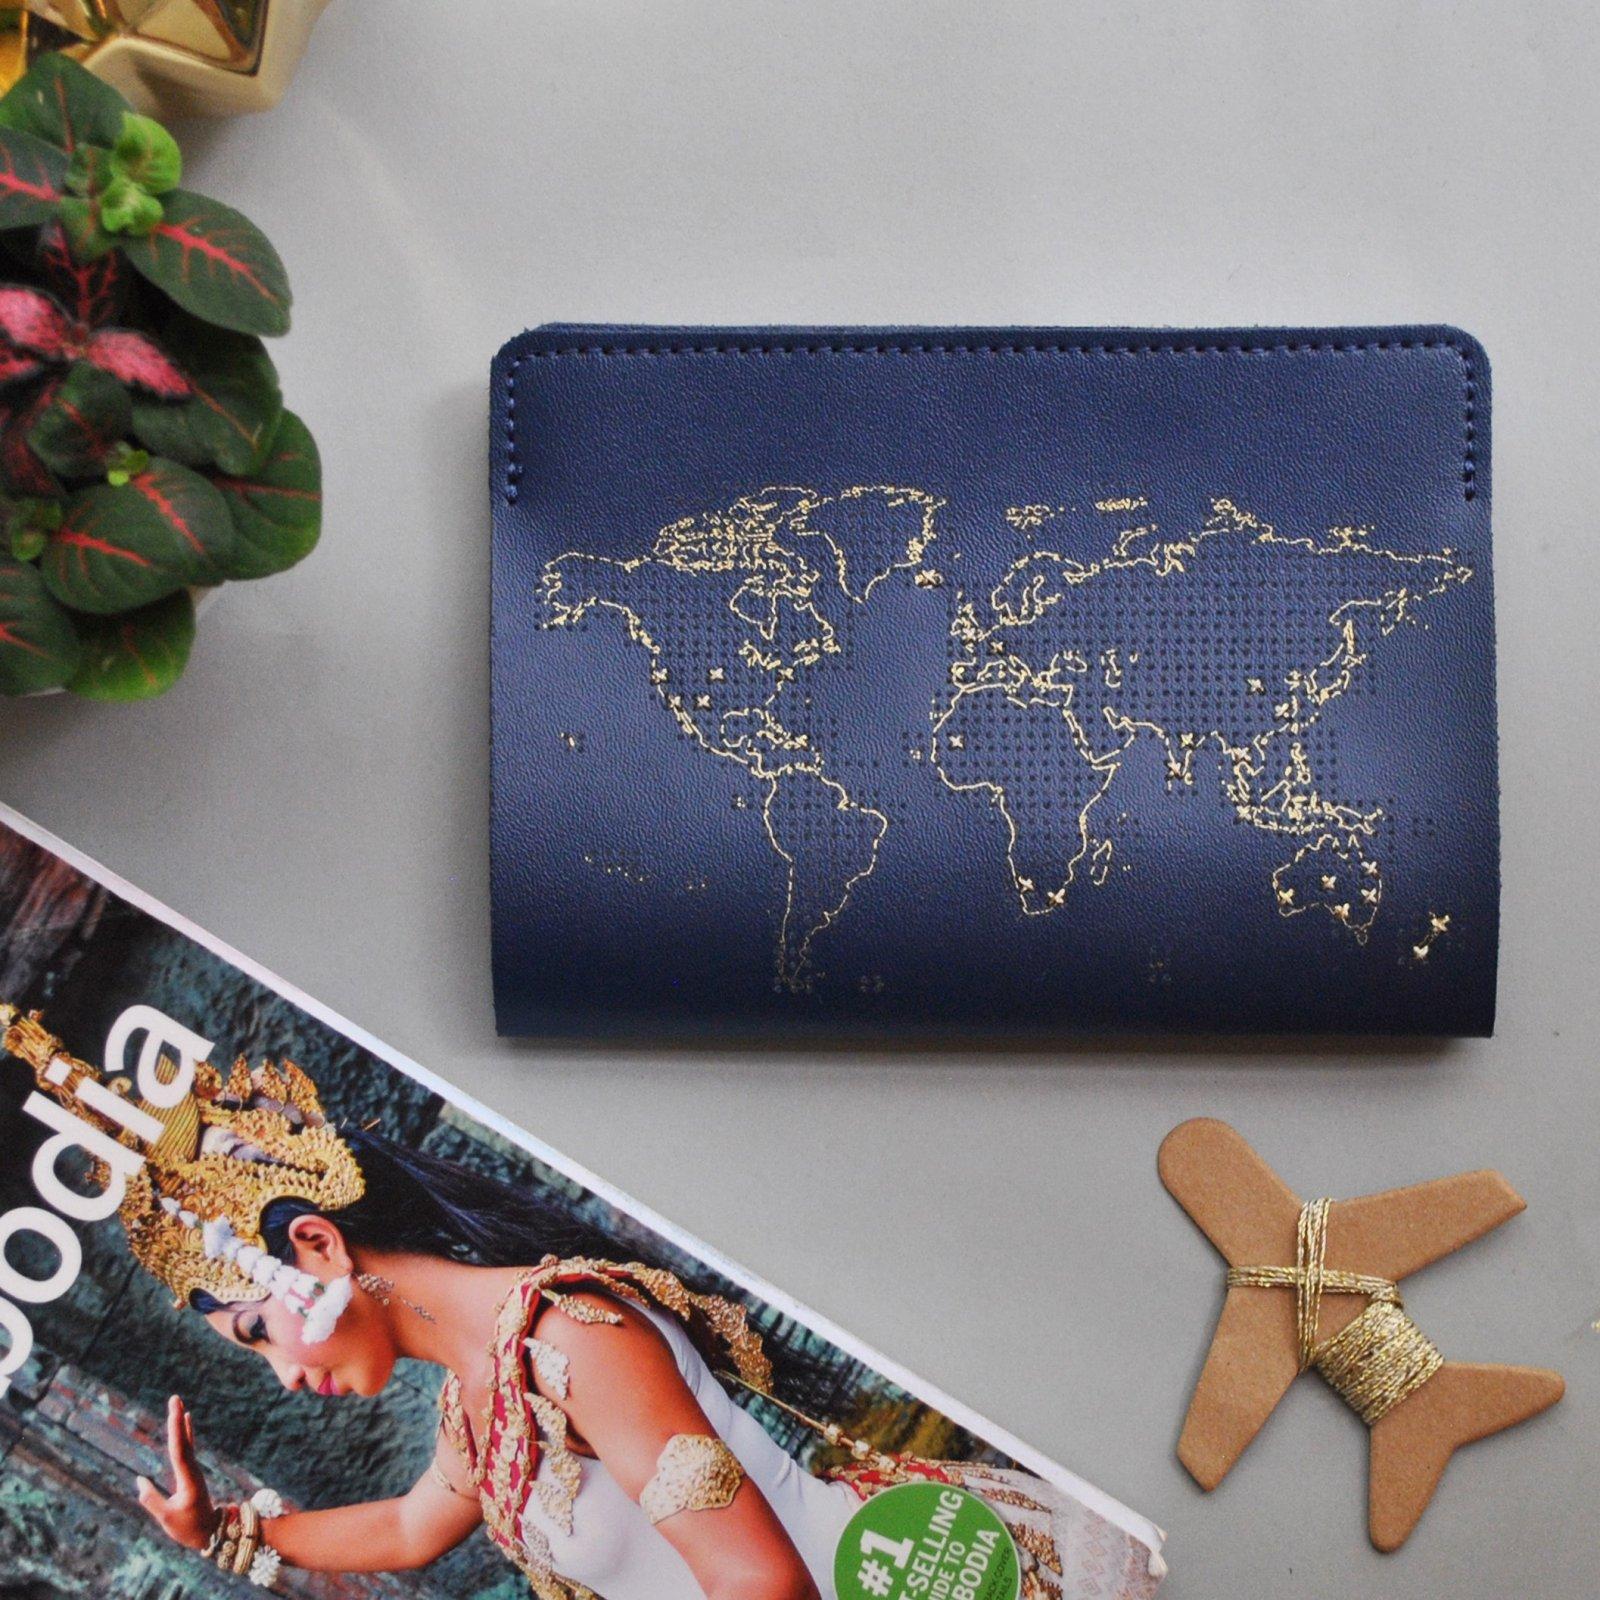 Stitch Leather Passport Cover - Navy